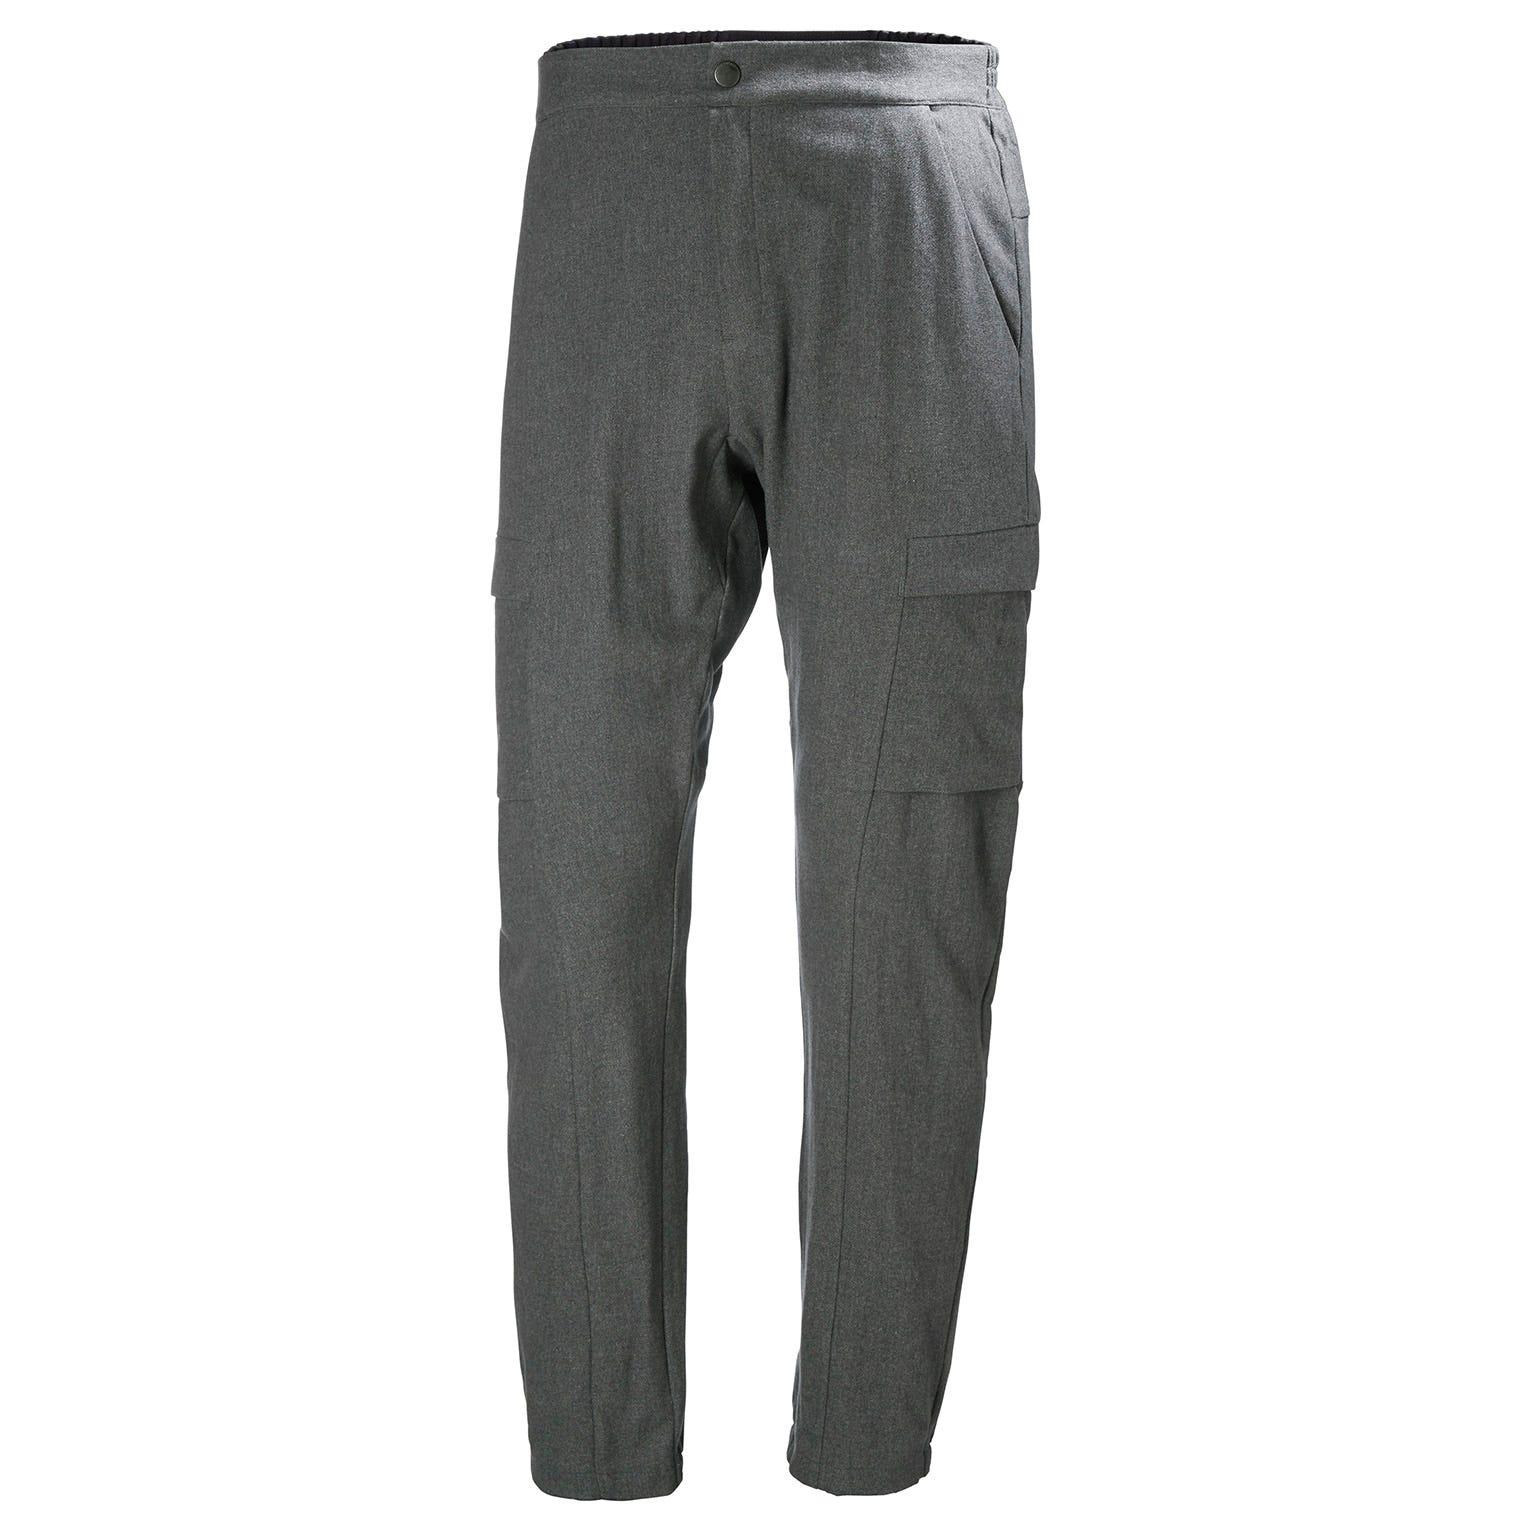 Helly Hansen Wool Travel Hiking Pant Grey S